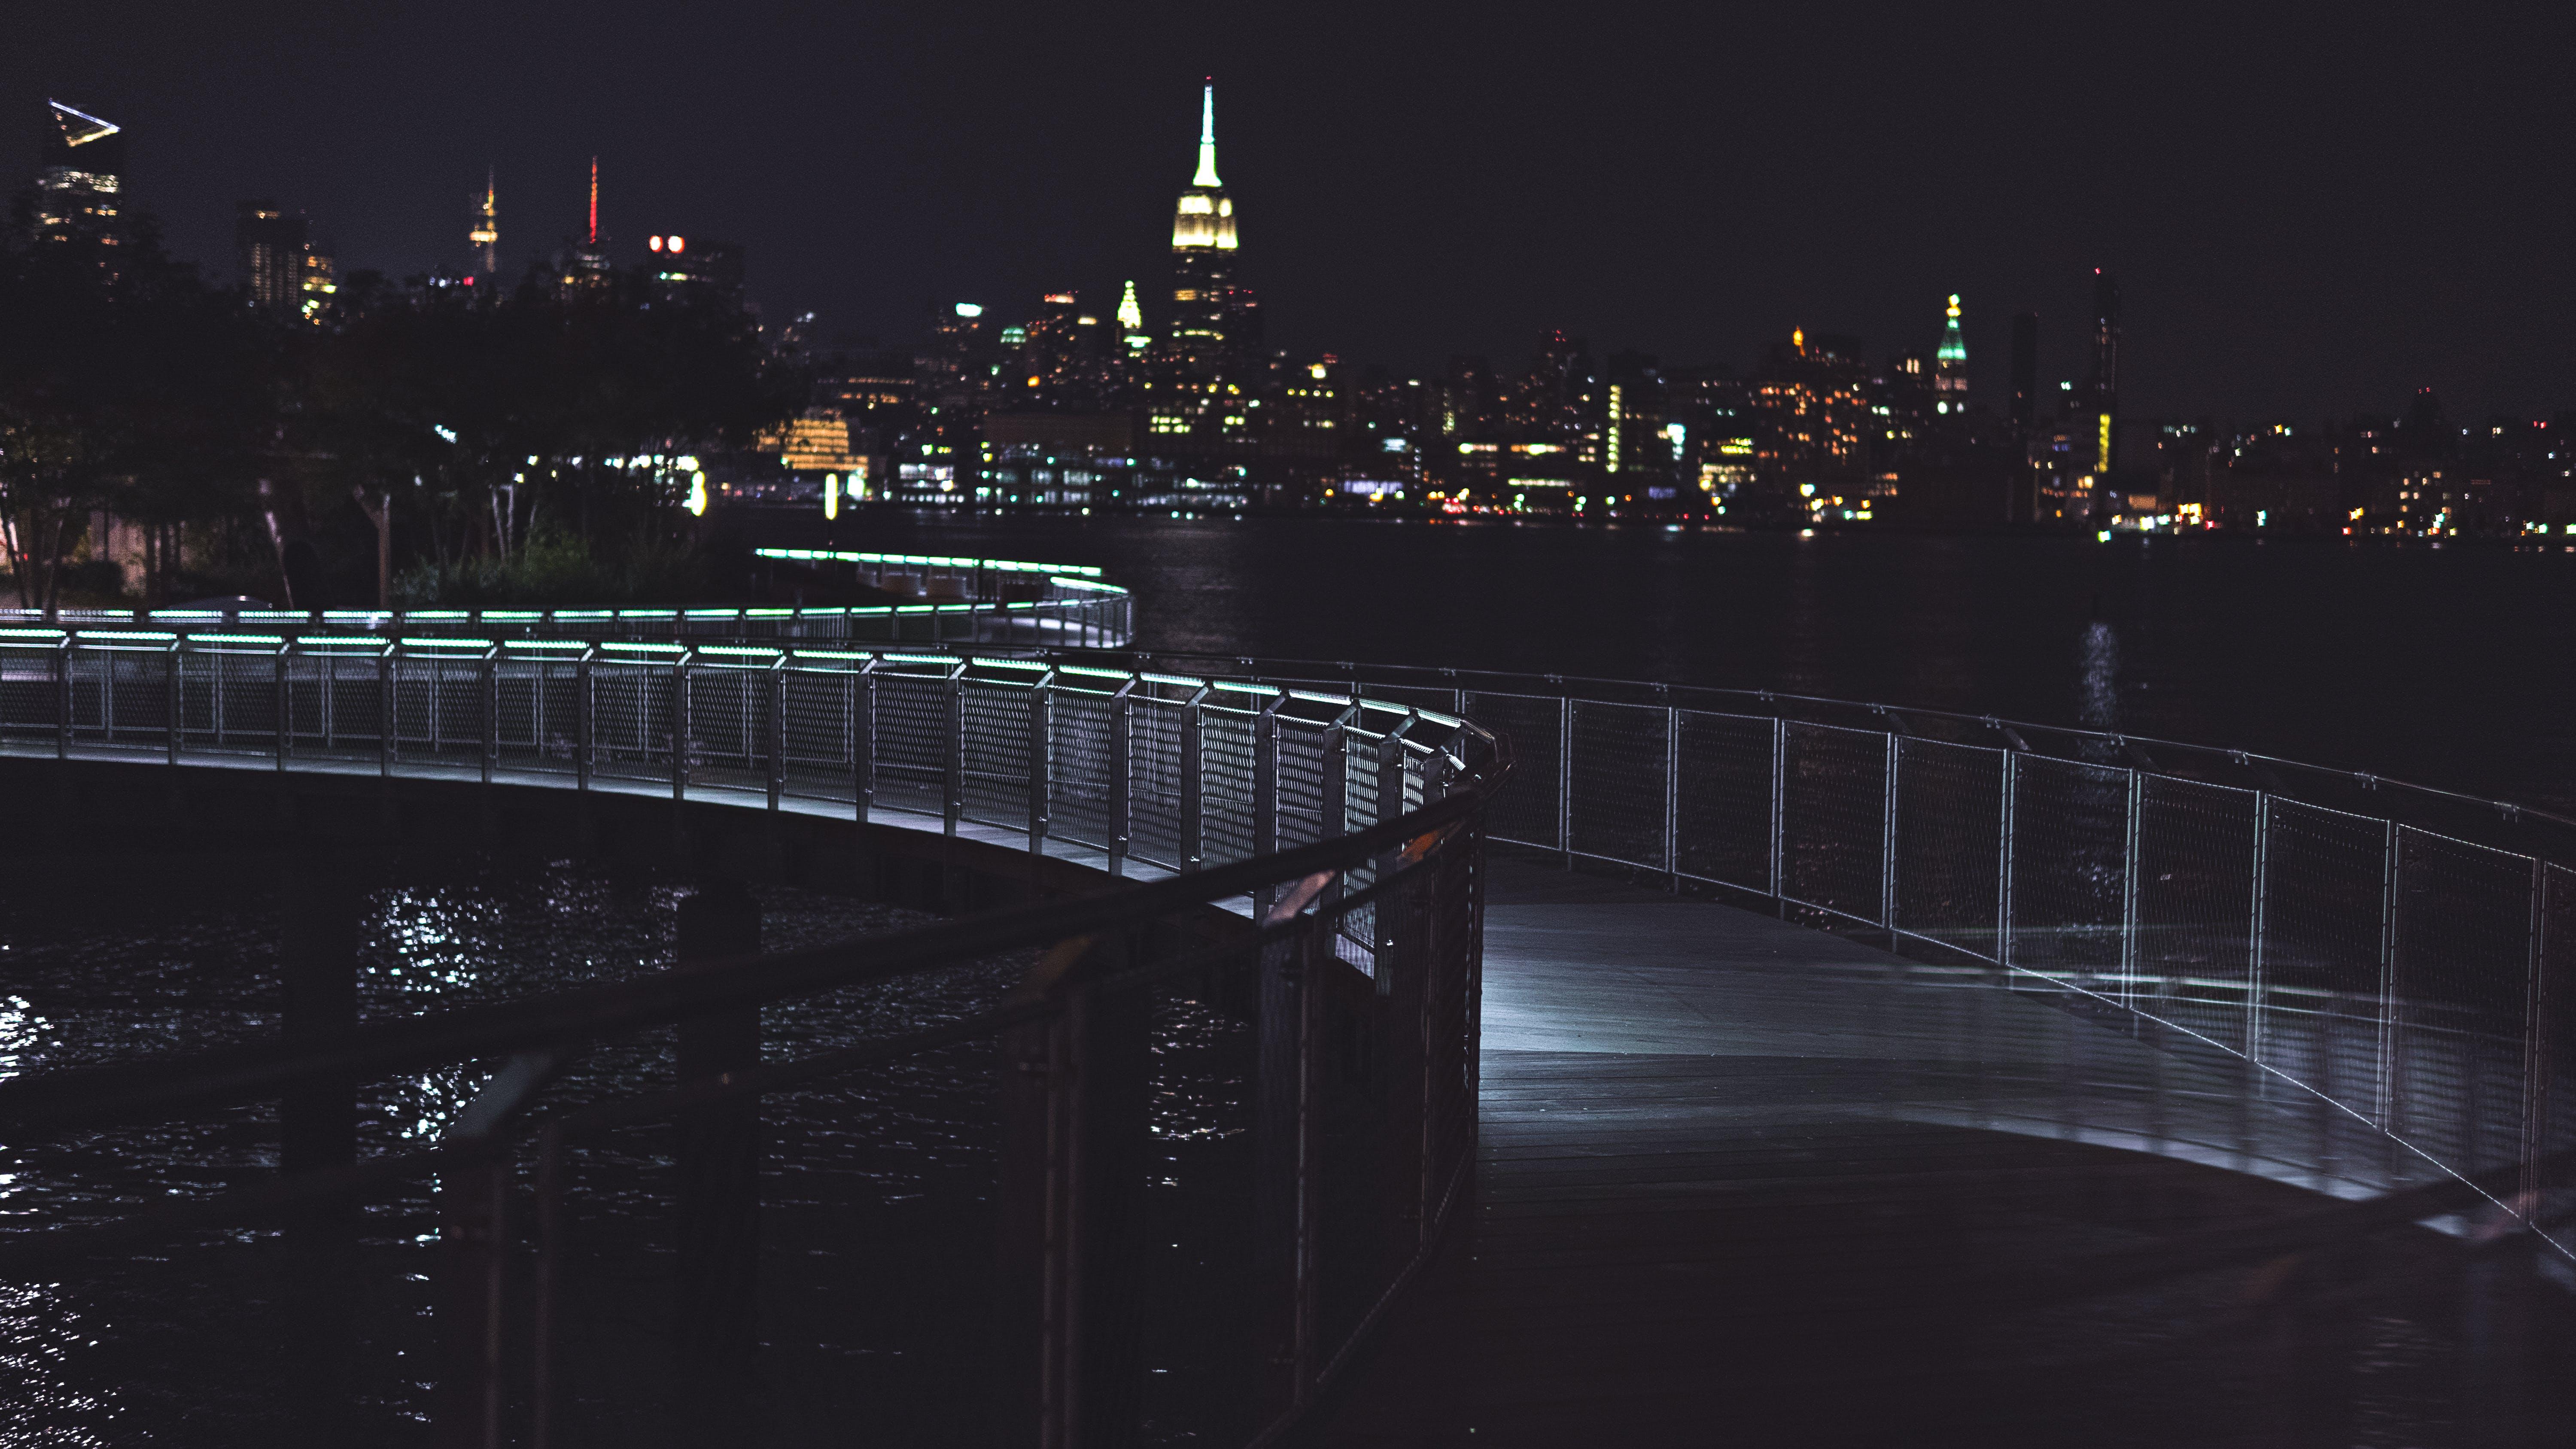 Free stock photo of city, lights, new york, bridges